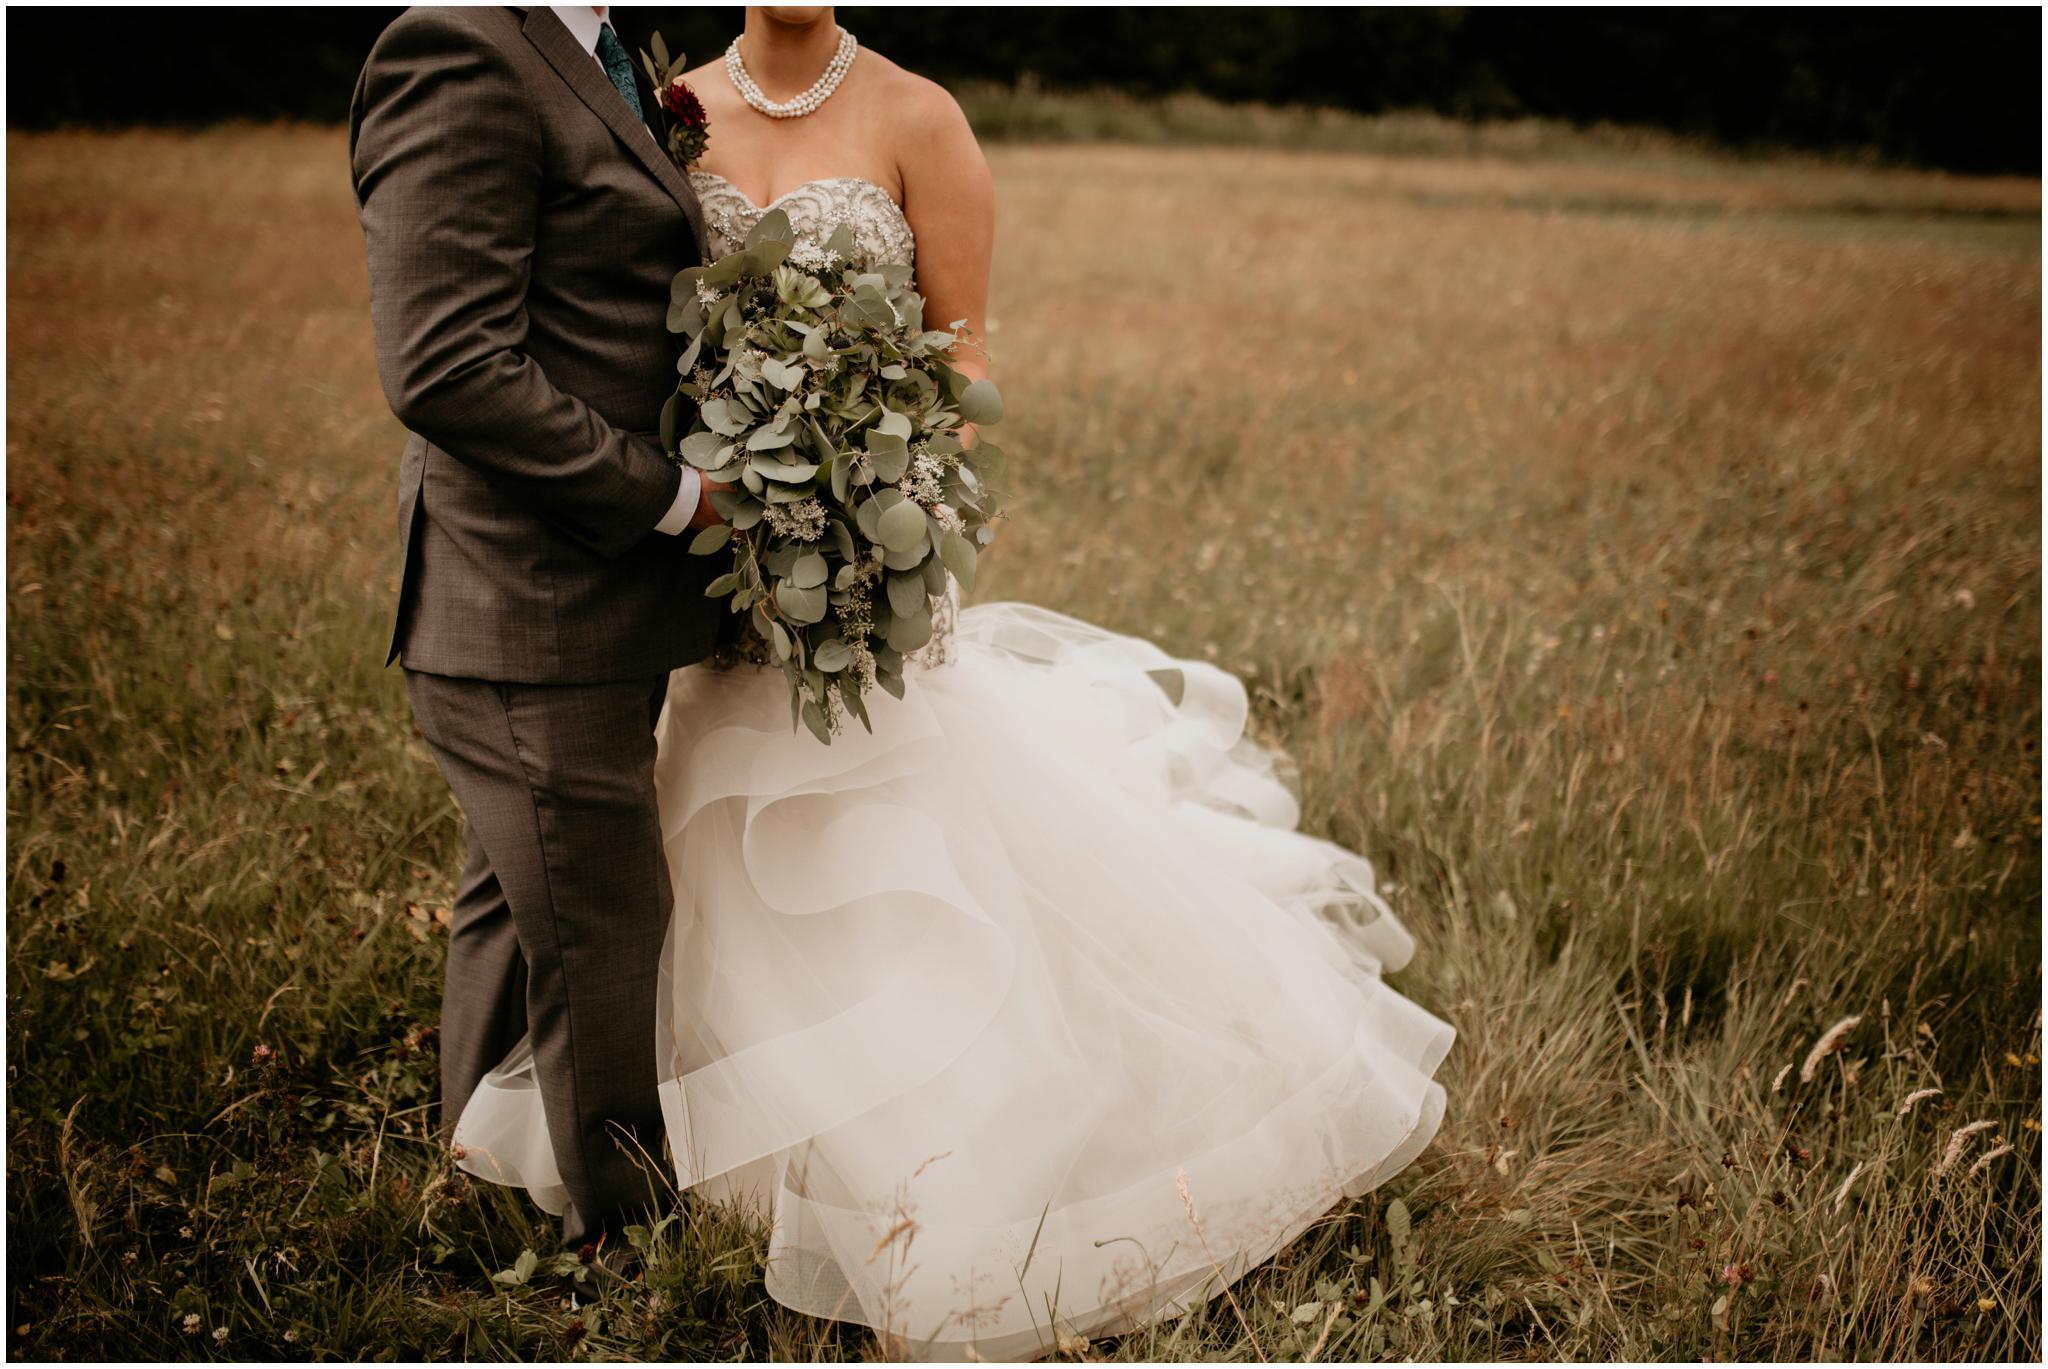 alex-and-matthew-three-cs-farm-venue-seattle-wedding-photographer-041.jpg